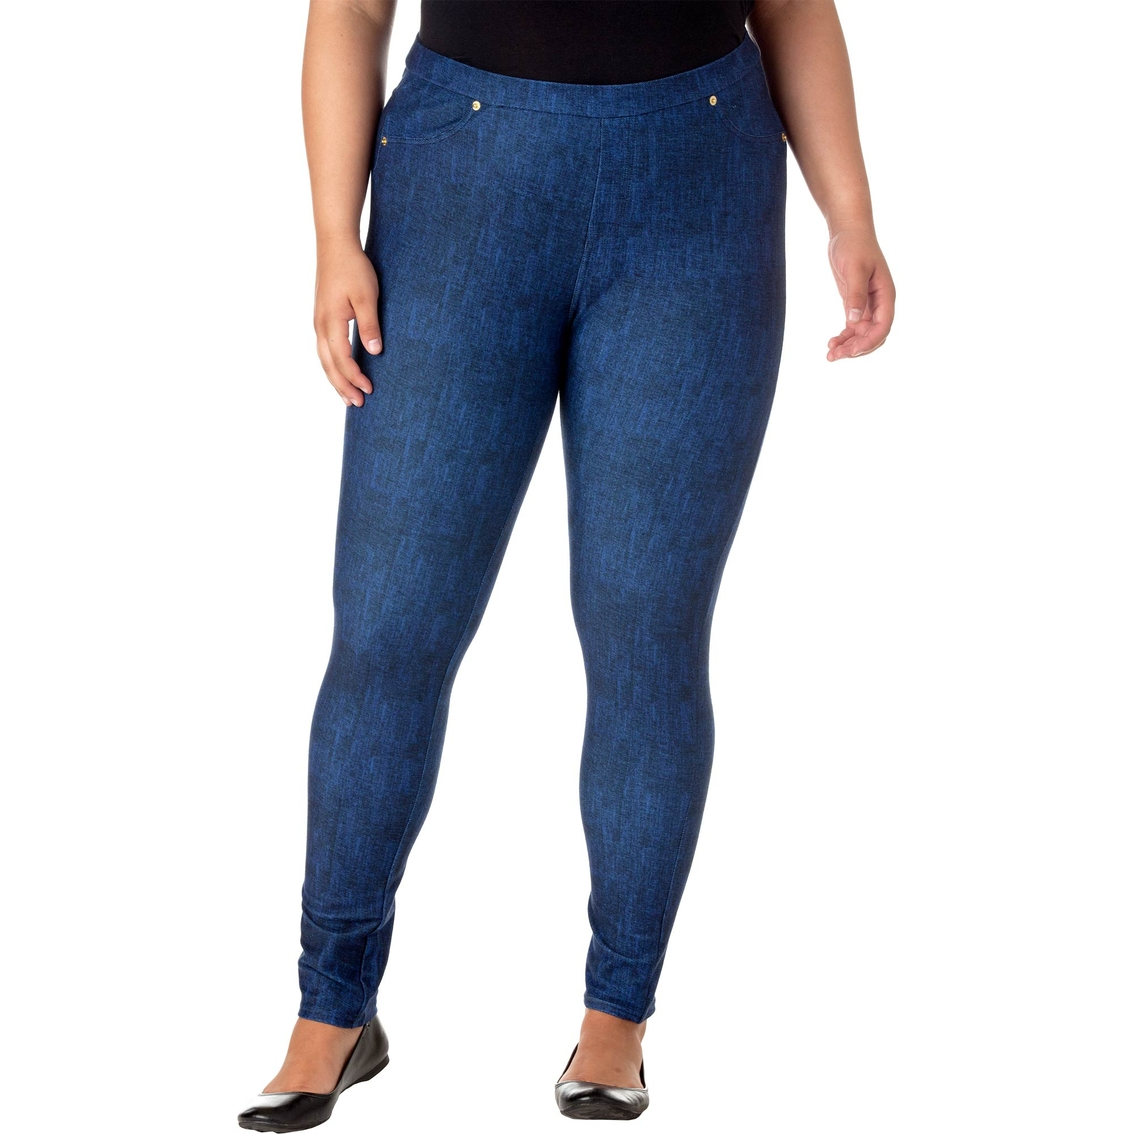 Michael kors plus size classic wash leggings apparel apparel michael kors plus size classic wash leggings malvernweather Gallery